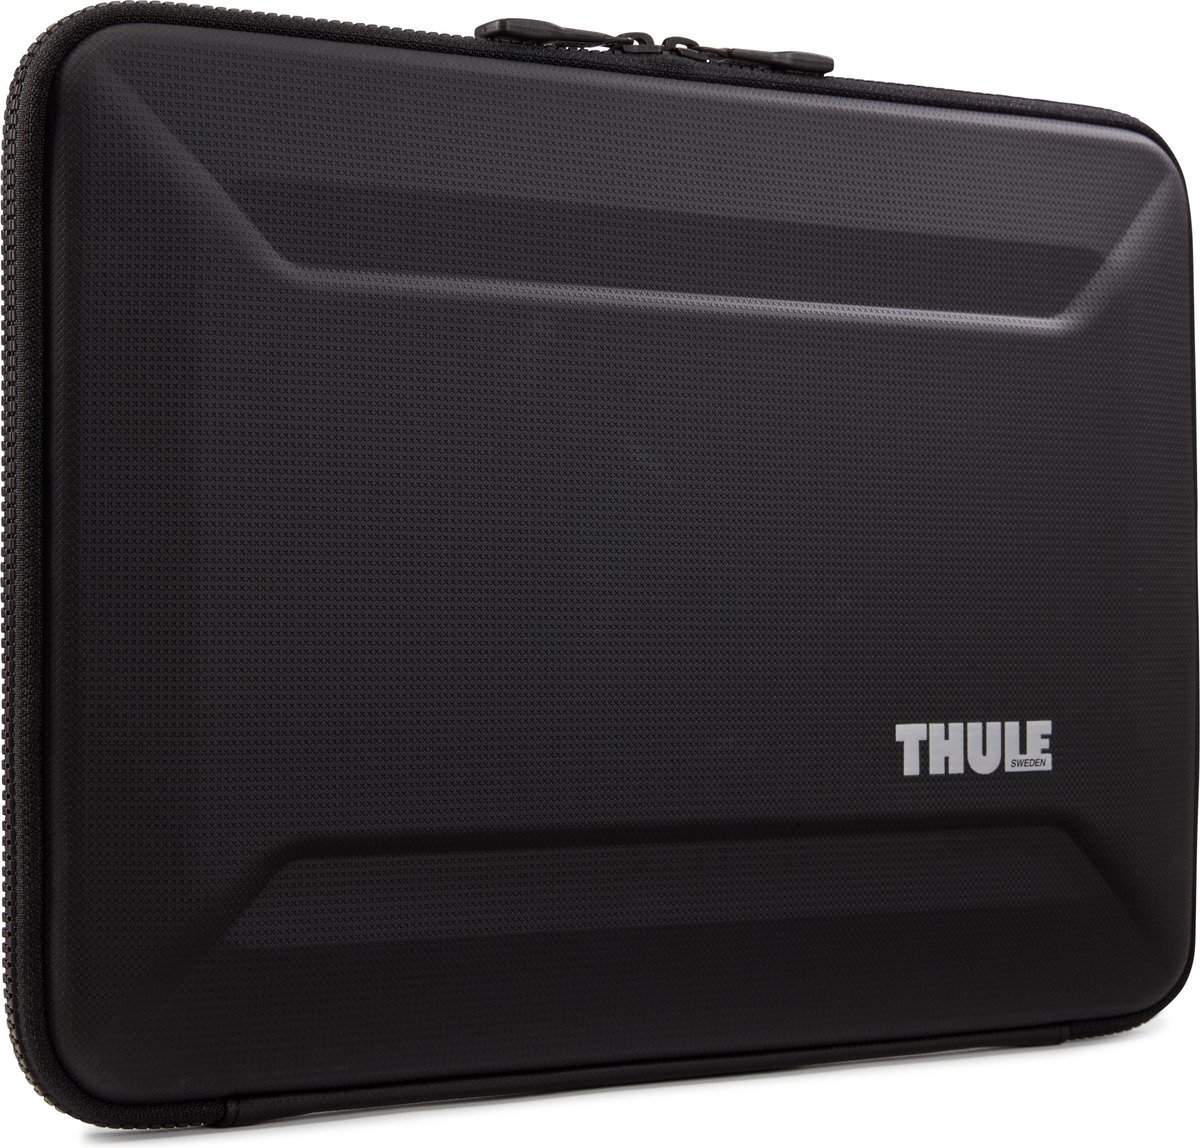 "Etui na Macbook 15"" Thule Gauntlet - czarny"